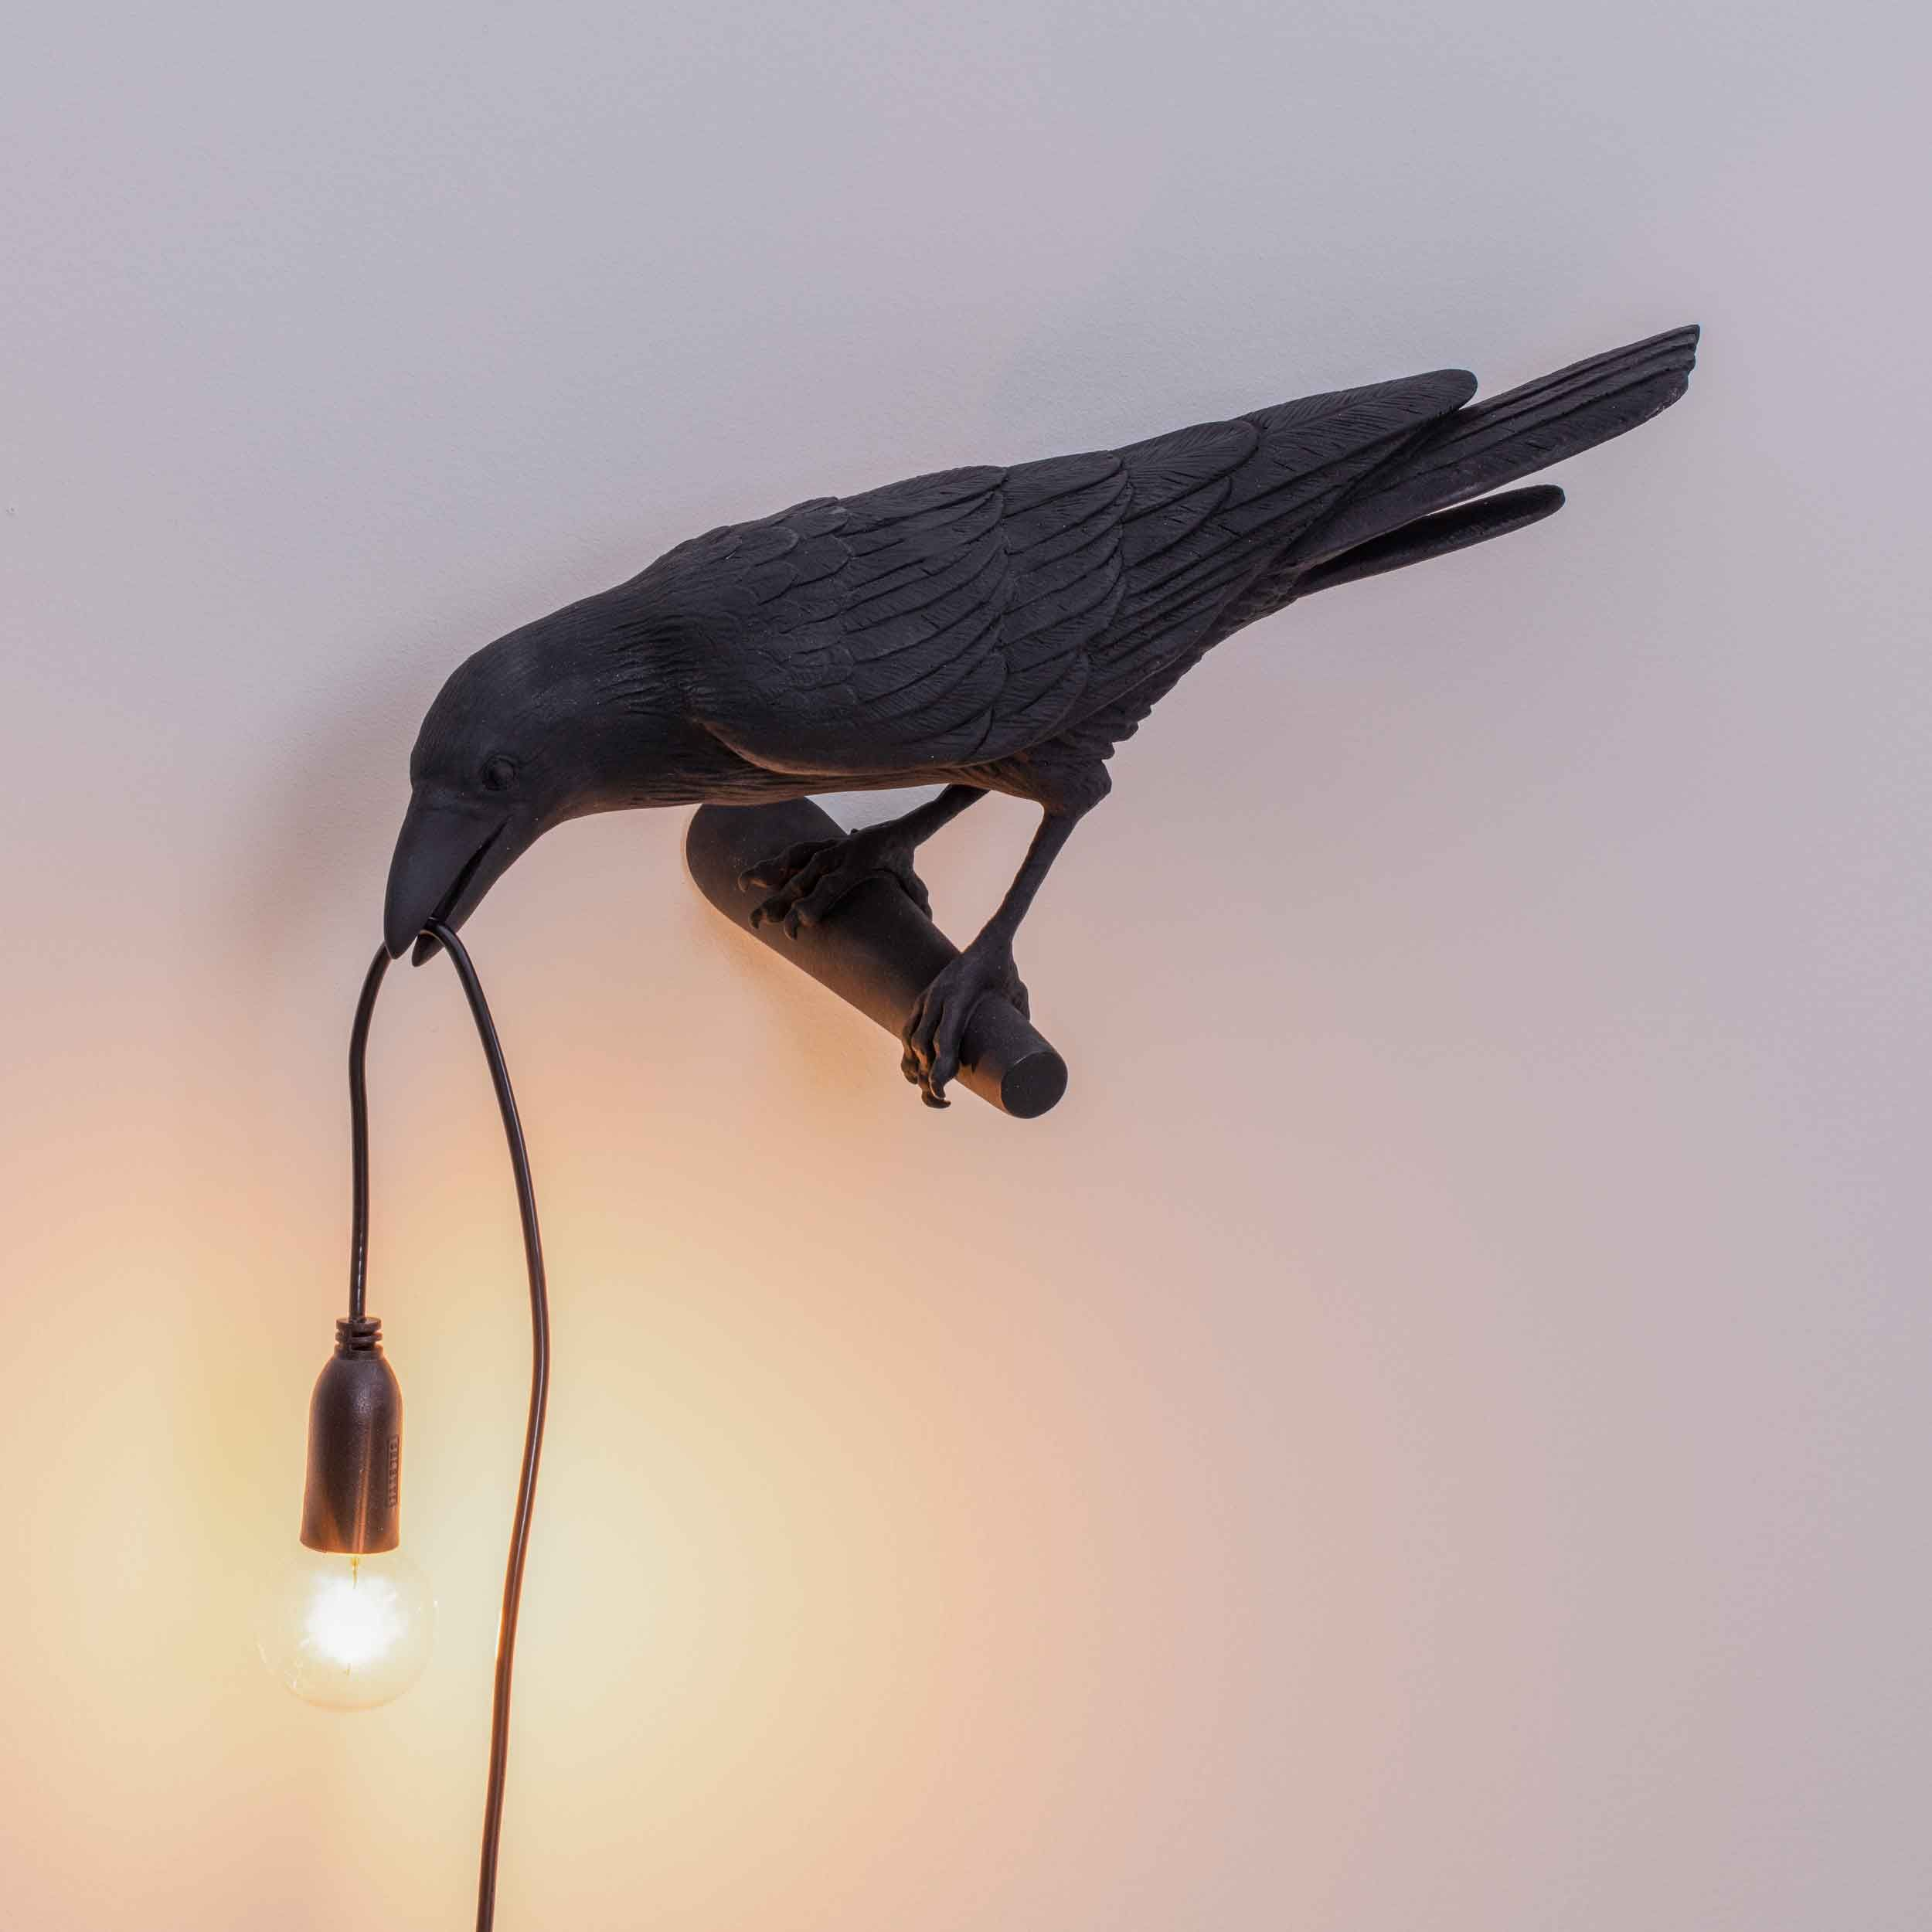 Photo of Seletti Bird Wall Lamp Looking Left